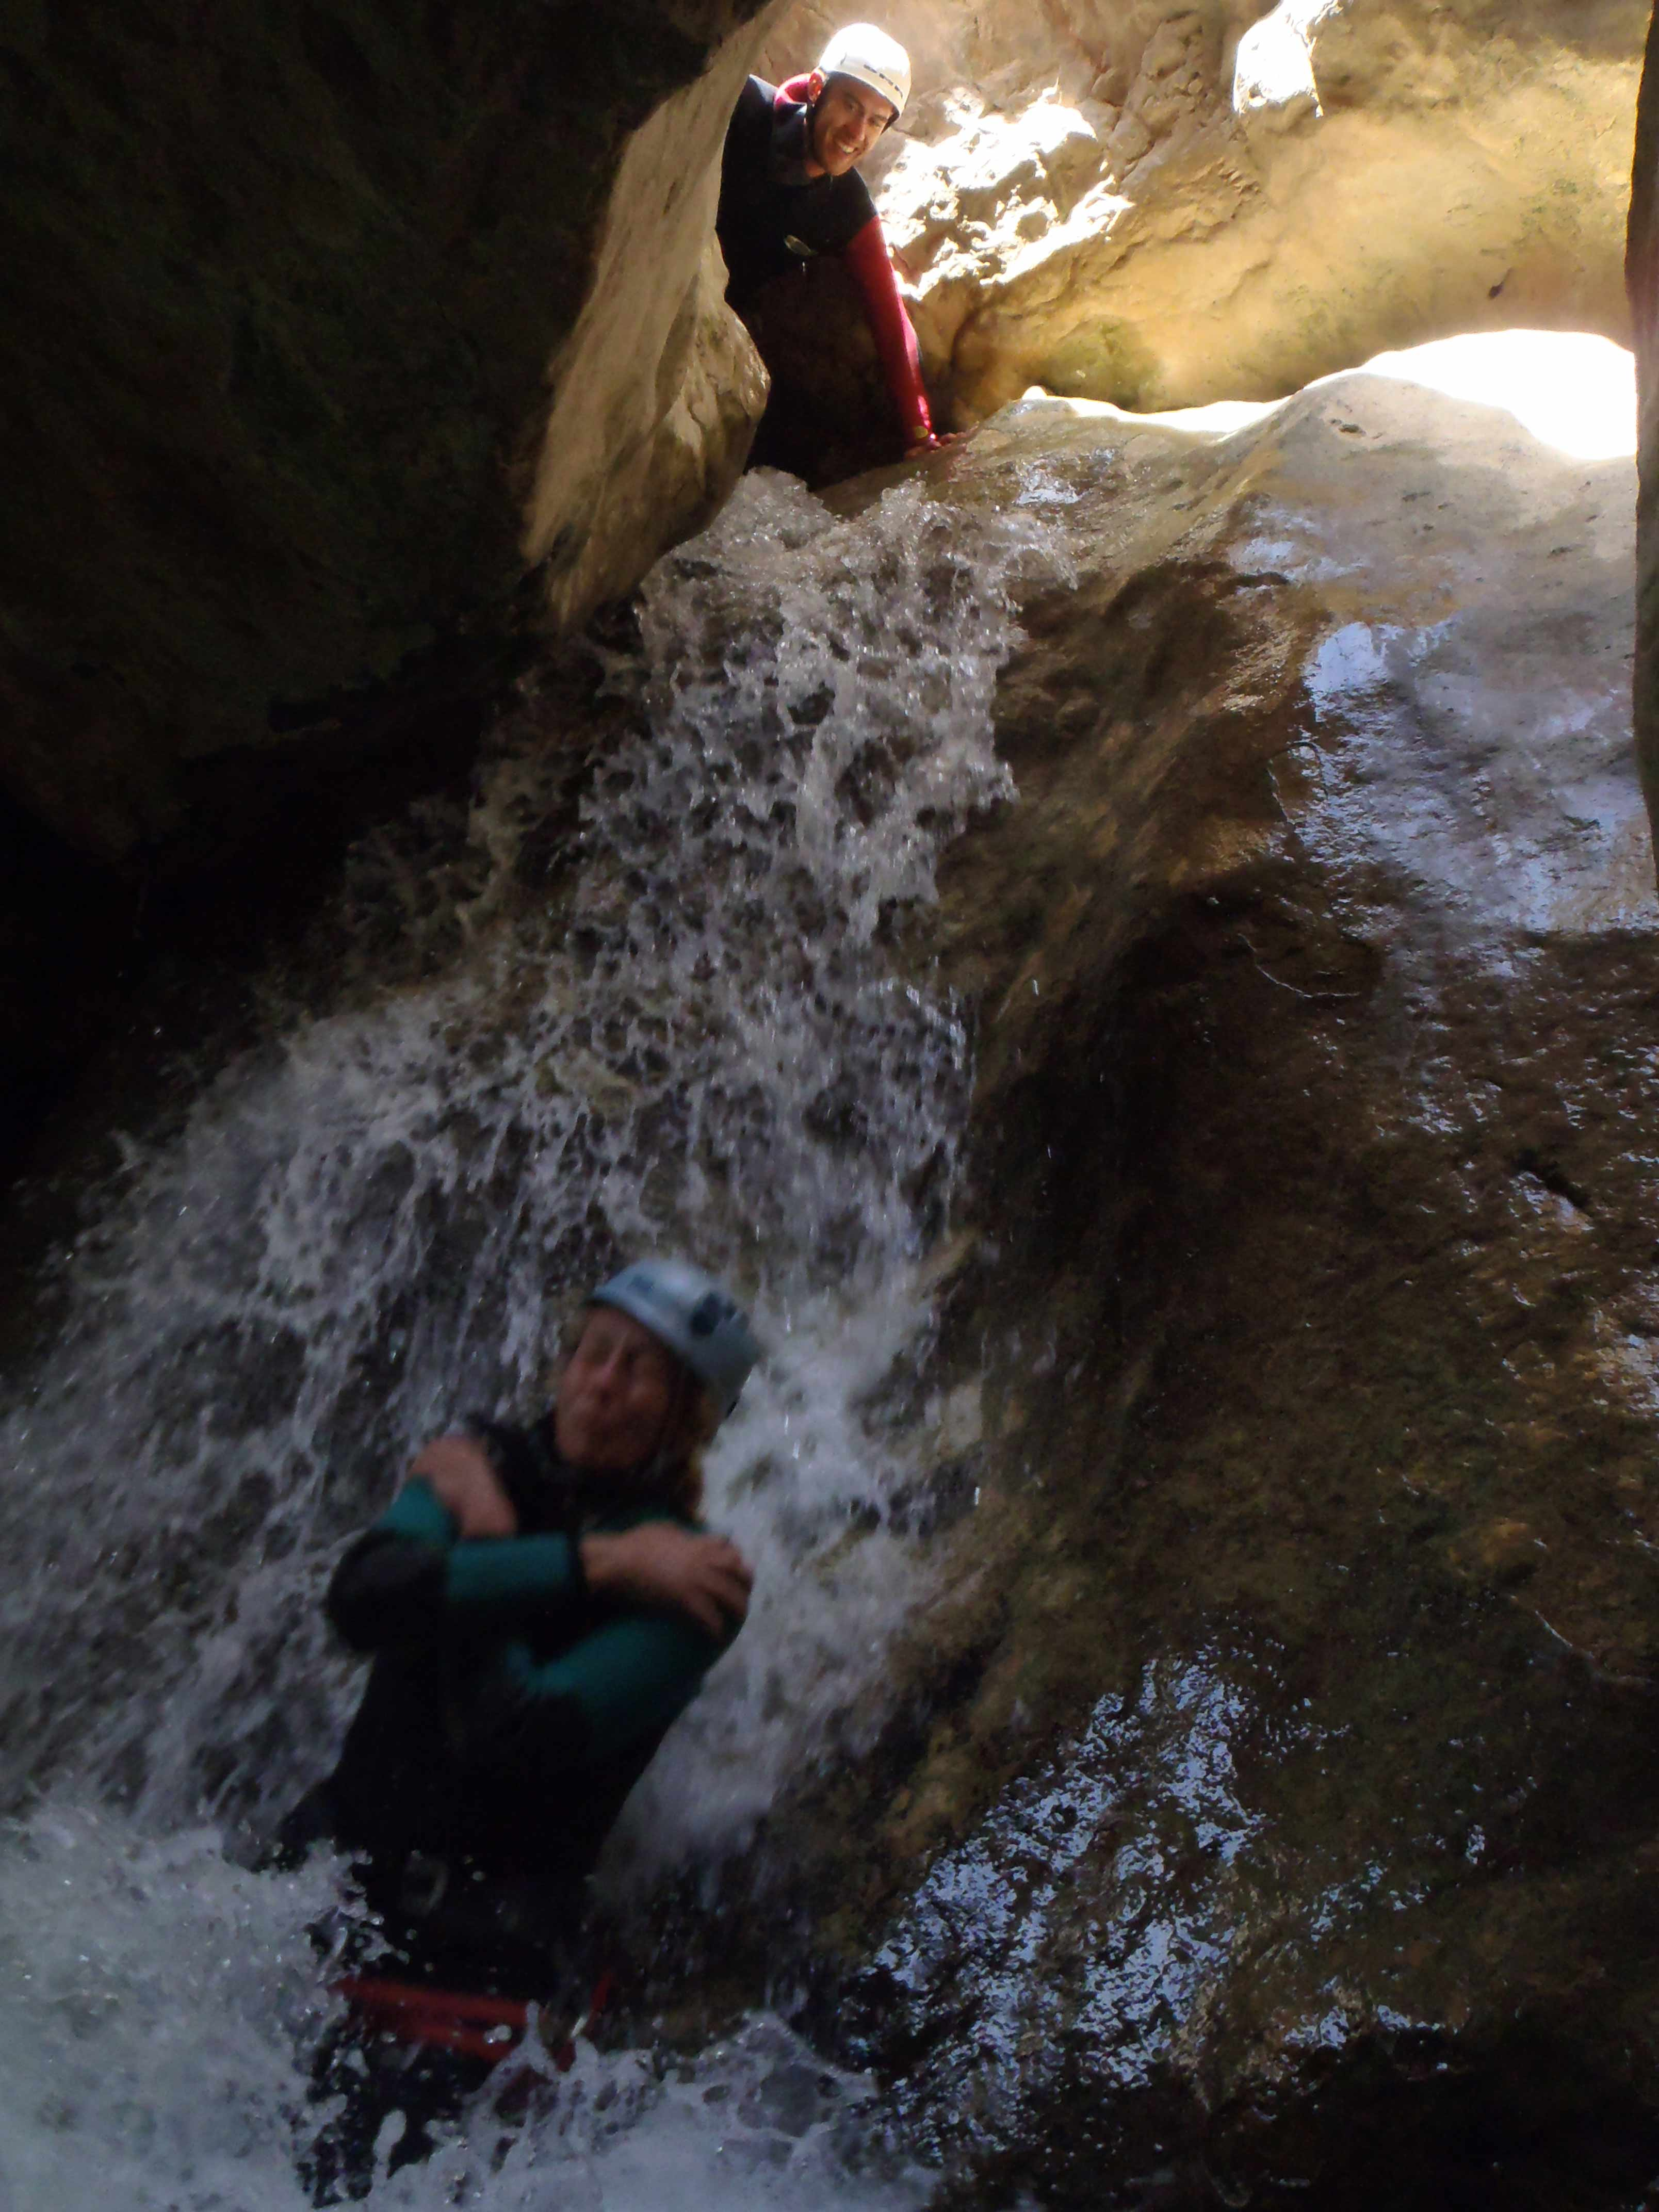 canyon,canyoning,canyonisme,séjour,haute-savoie,alpes maritimes,sierra de guara ,espagne,toboggan,vacance,saut